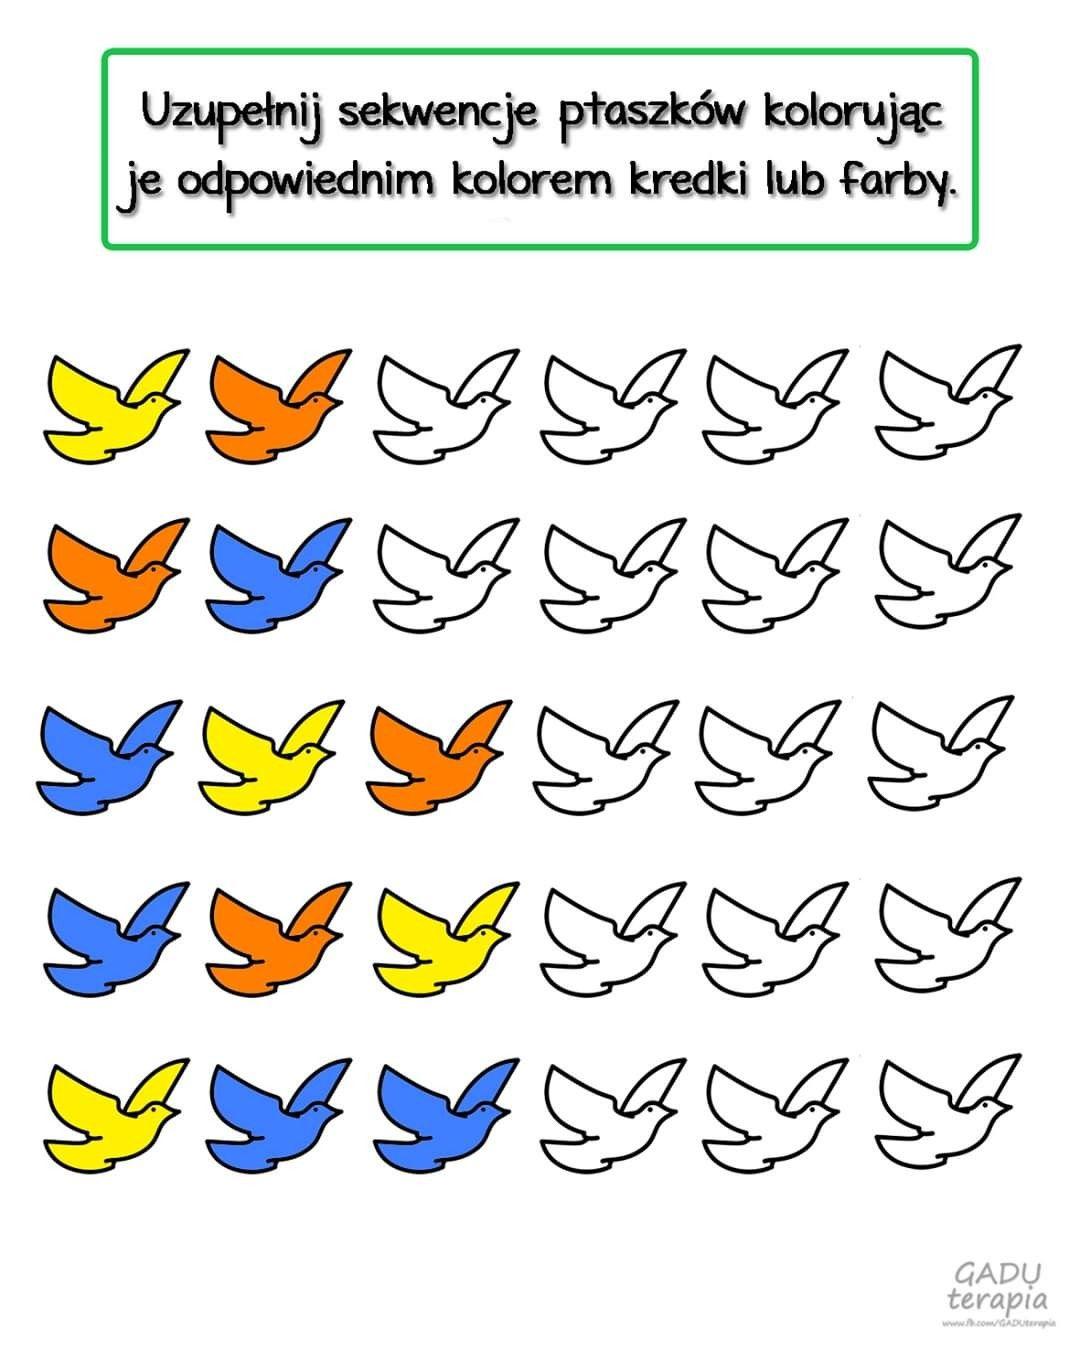 Pin By Ewa Jaszczak On Dziecieca Matematyka In 2020 Education Words Word Search Puzzle